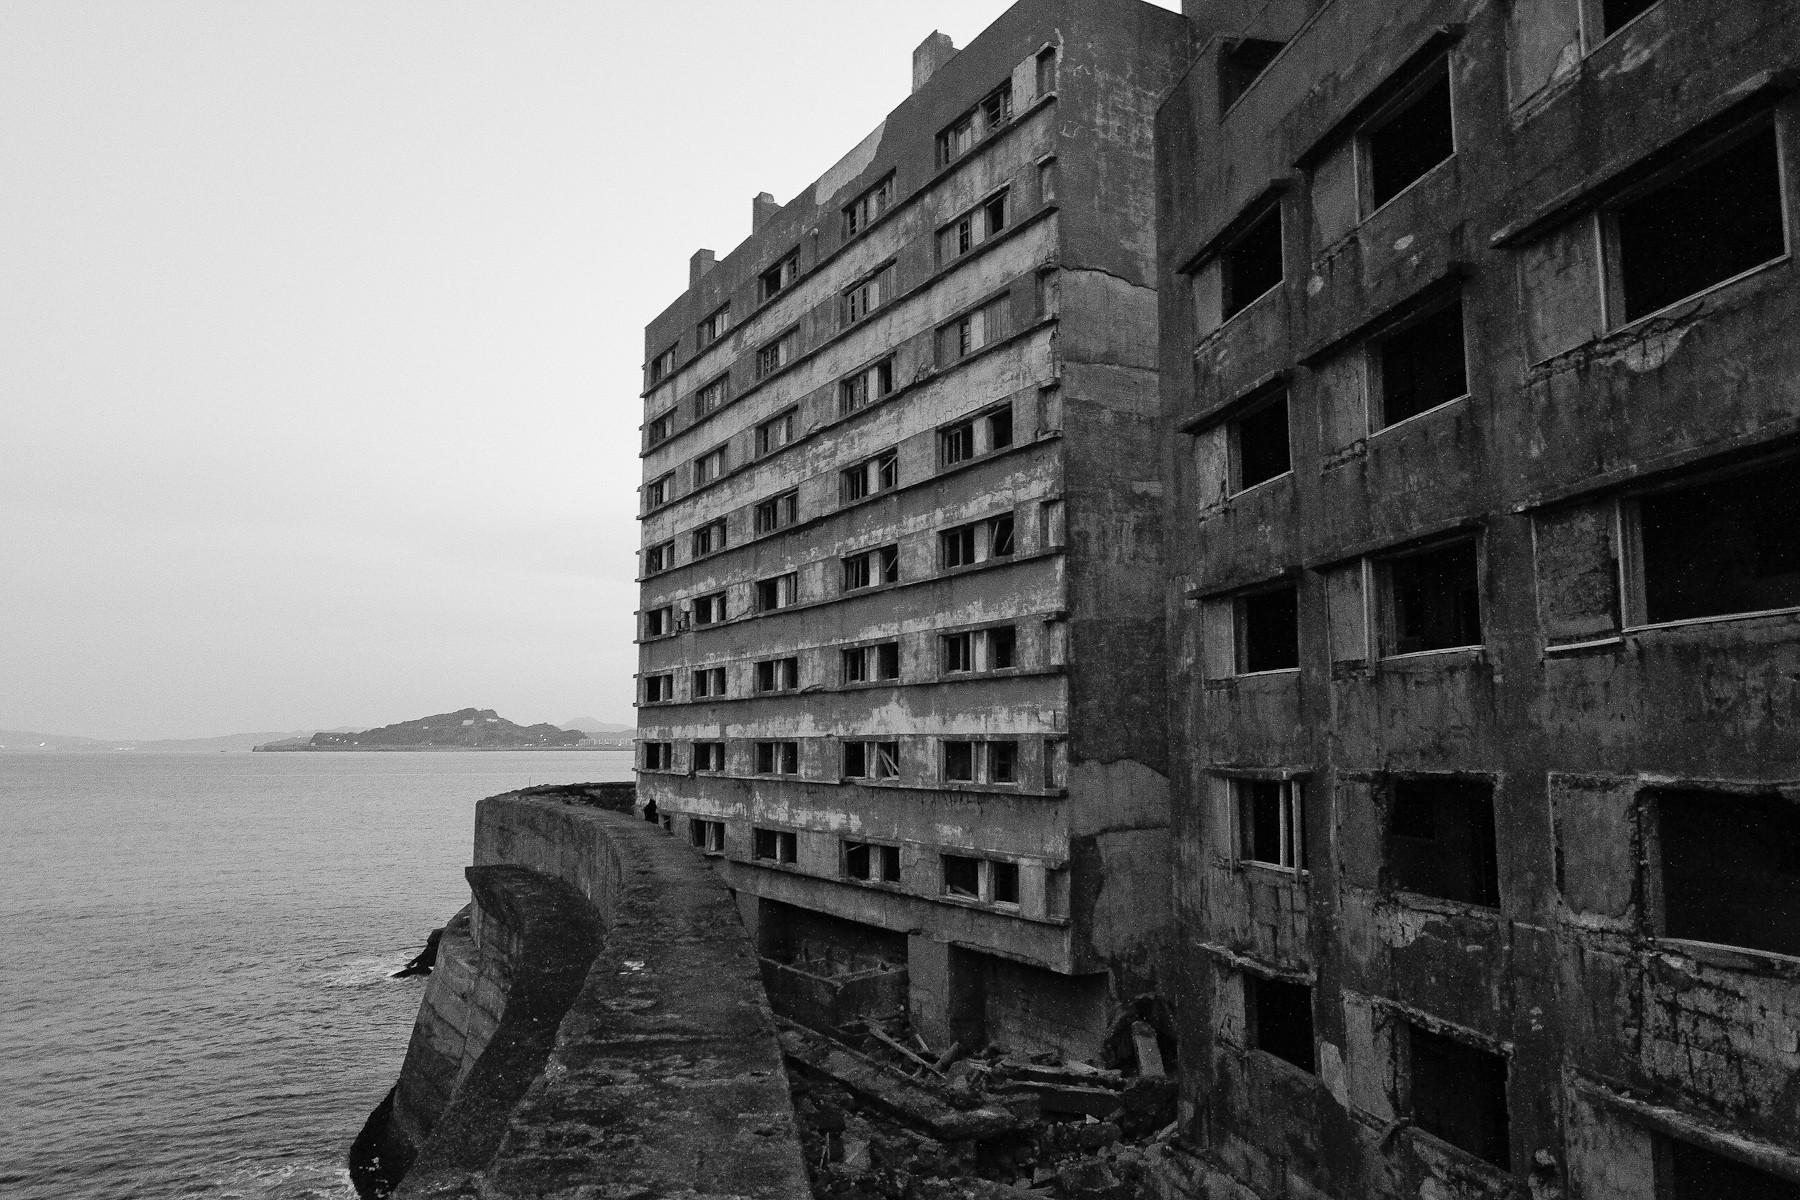 General 1800x1200 ruin Hashima island building monochrome